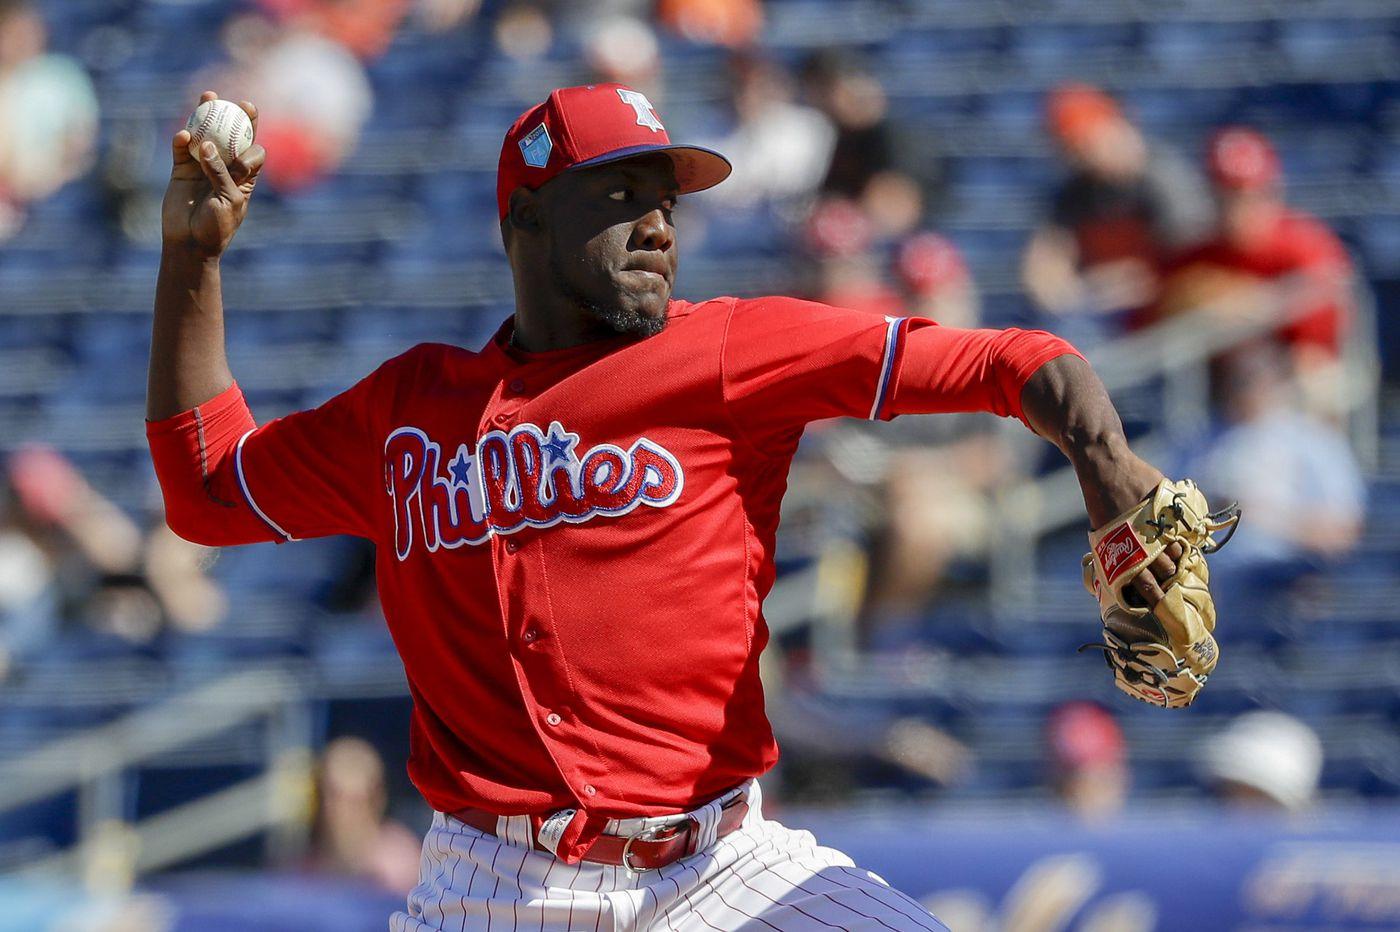 Phillies prospect Enyel De Los Santos in line to make major-league debut Tuesday